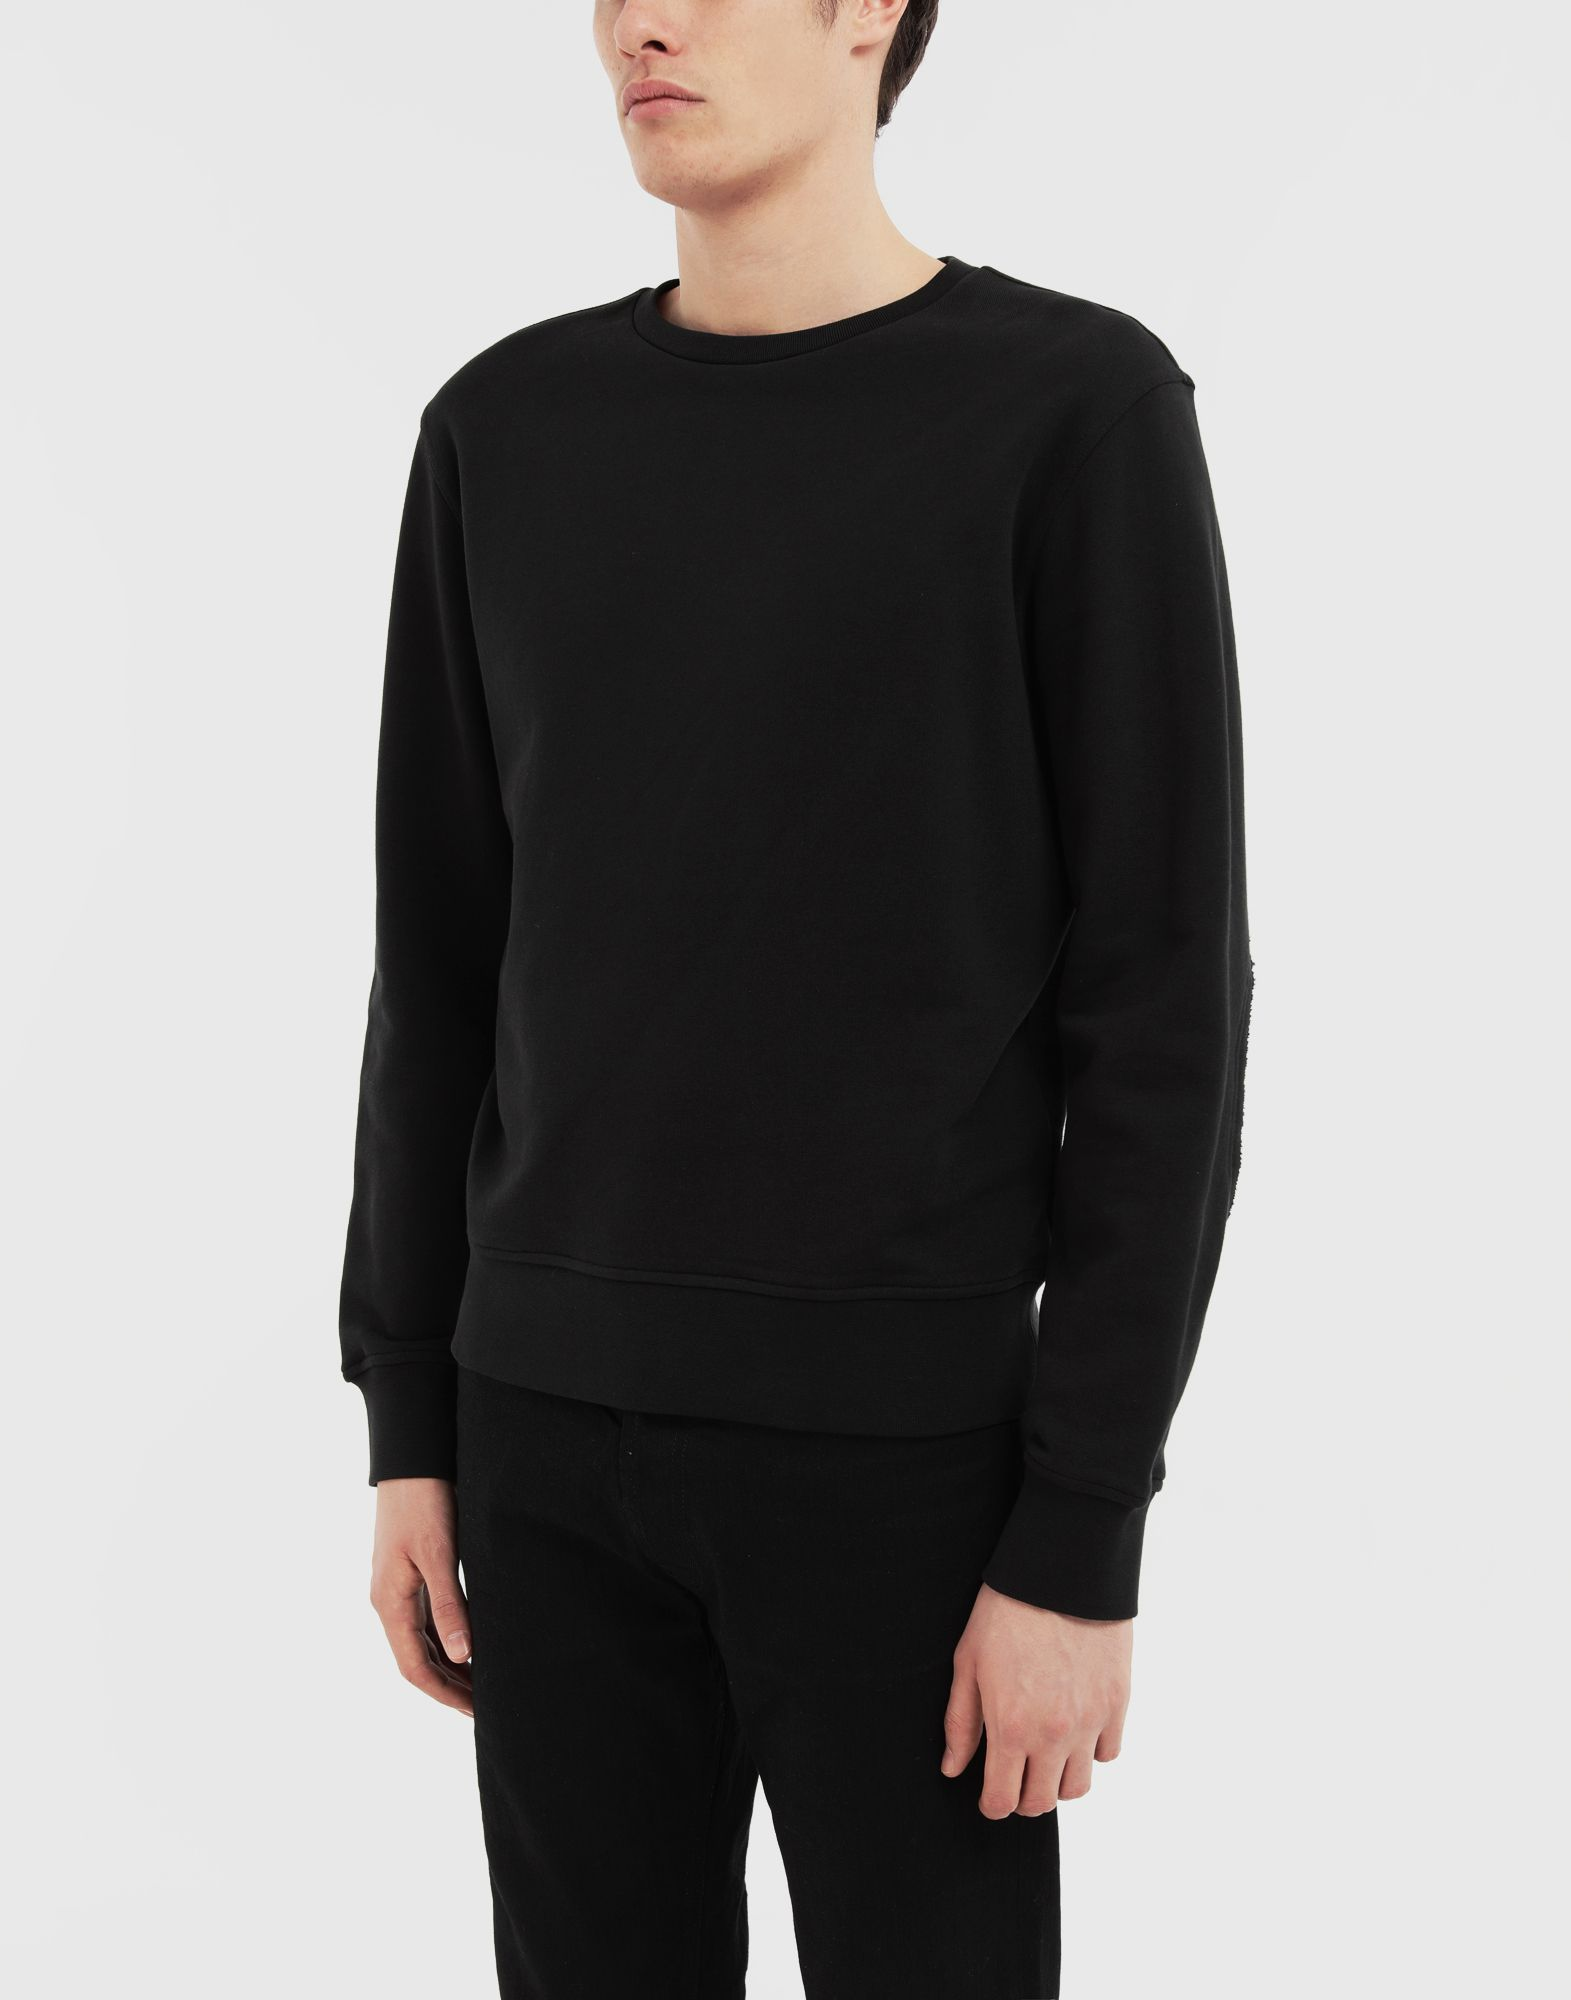 MAISON MARGIELA Décortiqué sweatshirt Sweatshirt Man r